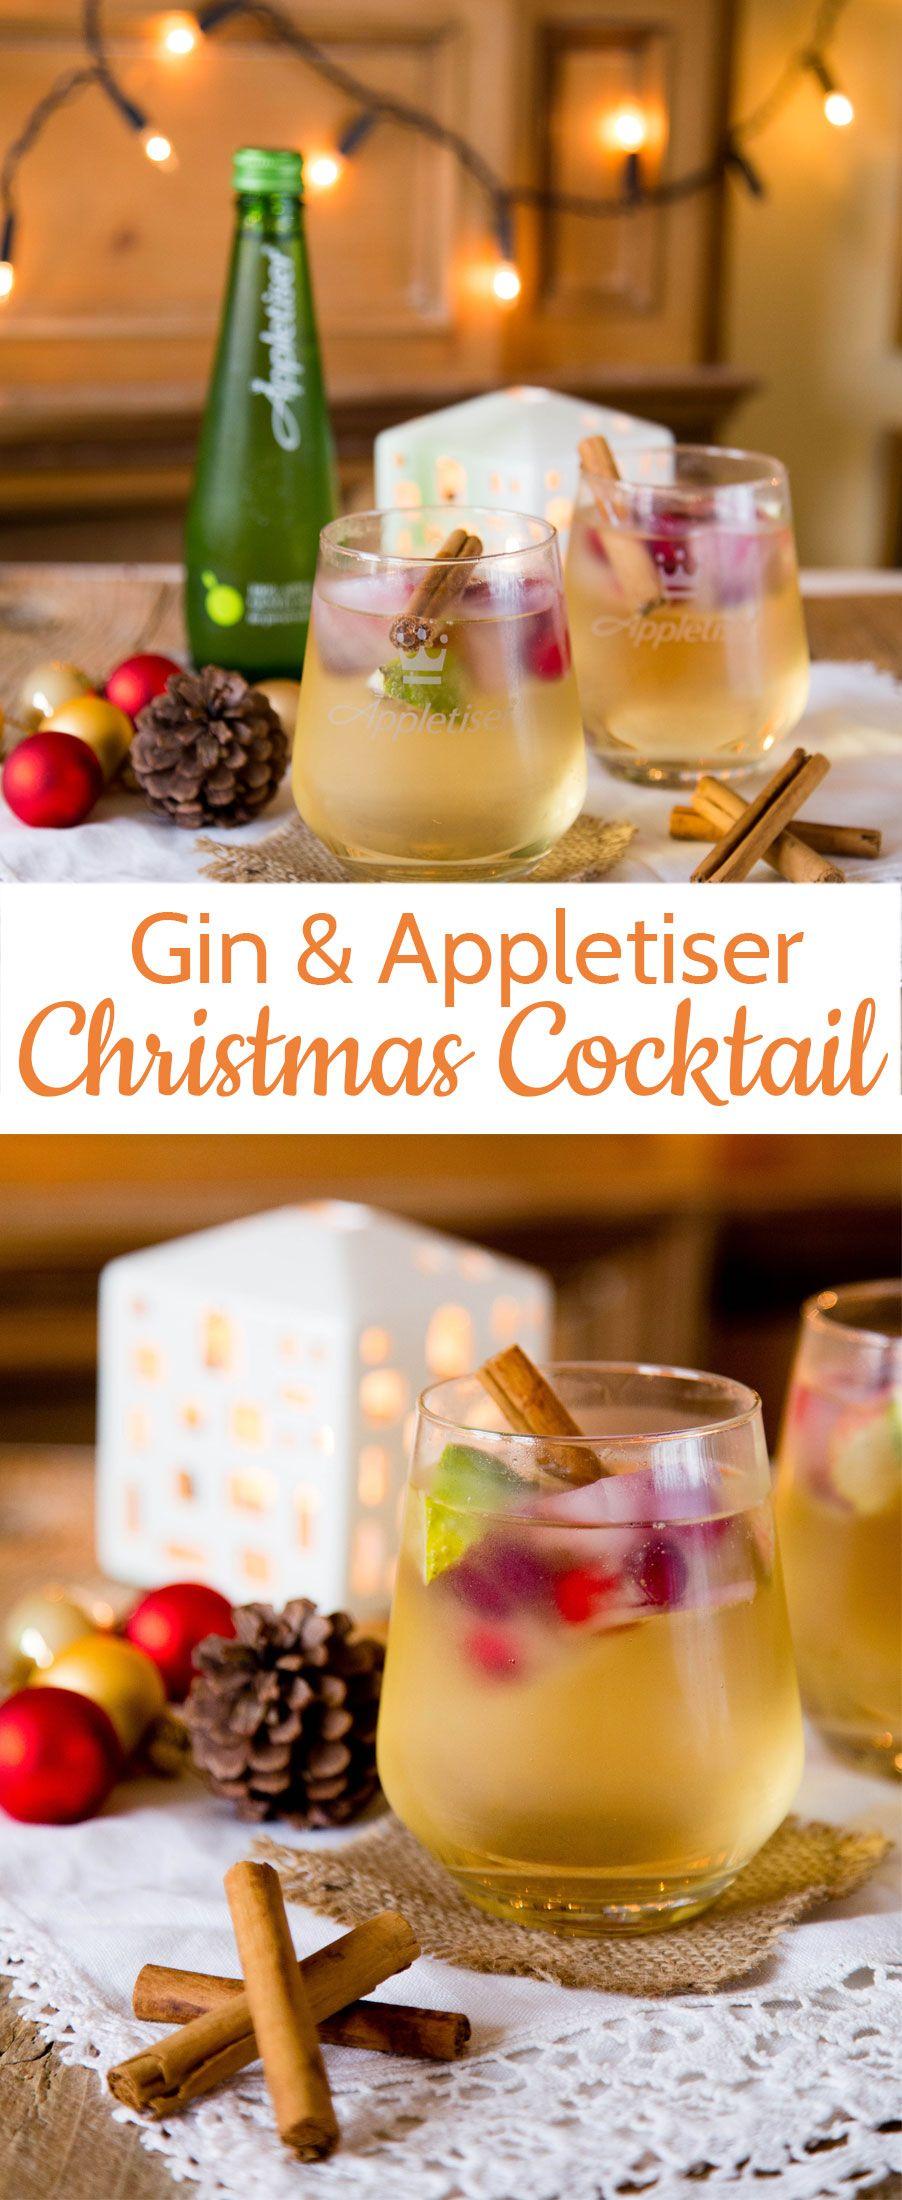 Gin & Appletiser a refreshing Christmas Cocktail | Rezept | Getränke ...